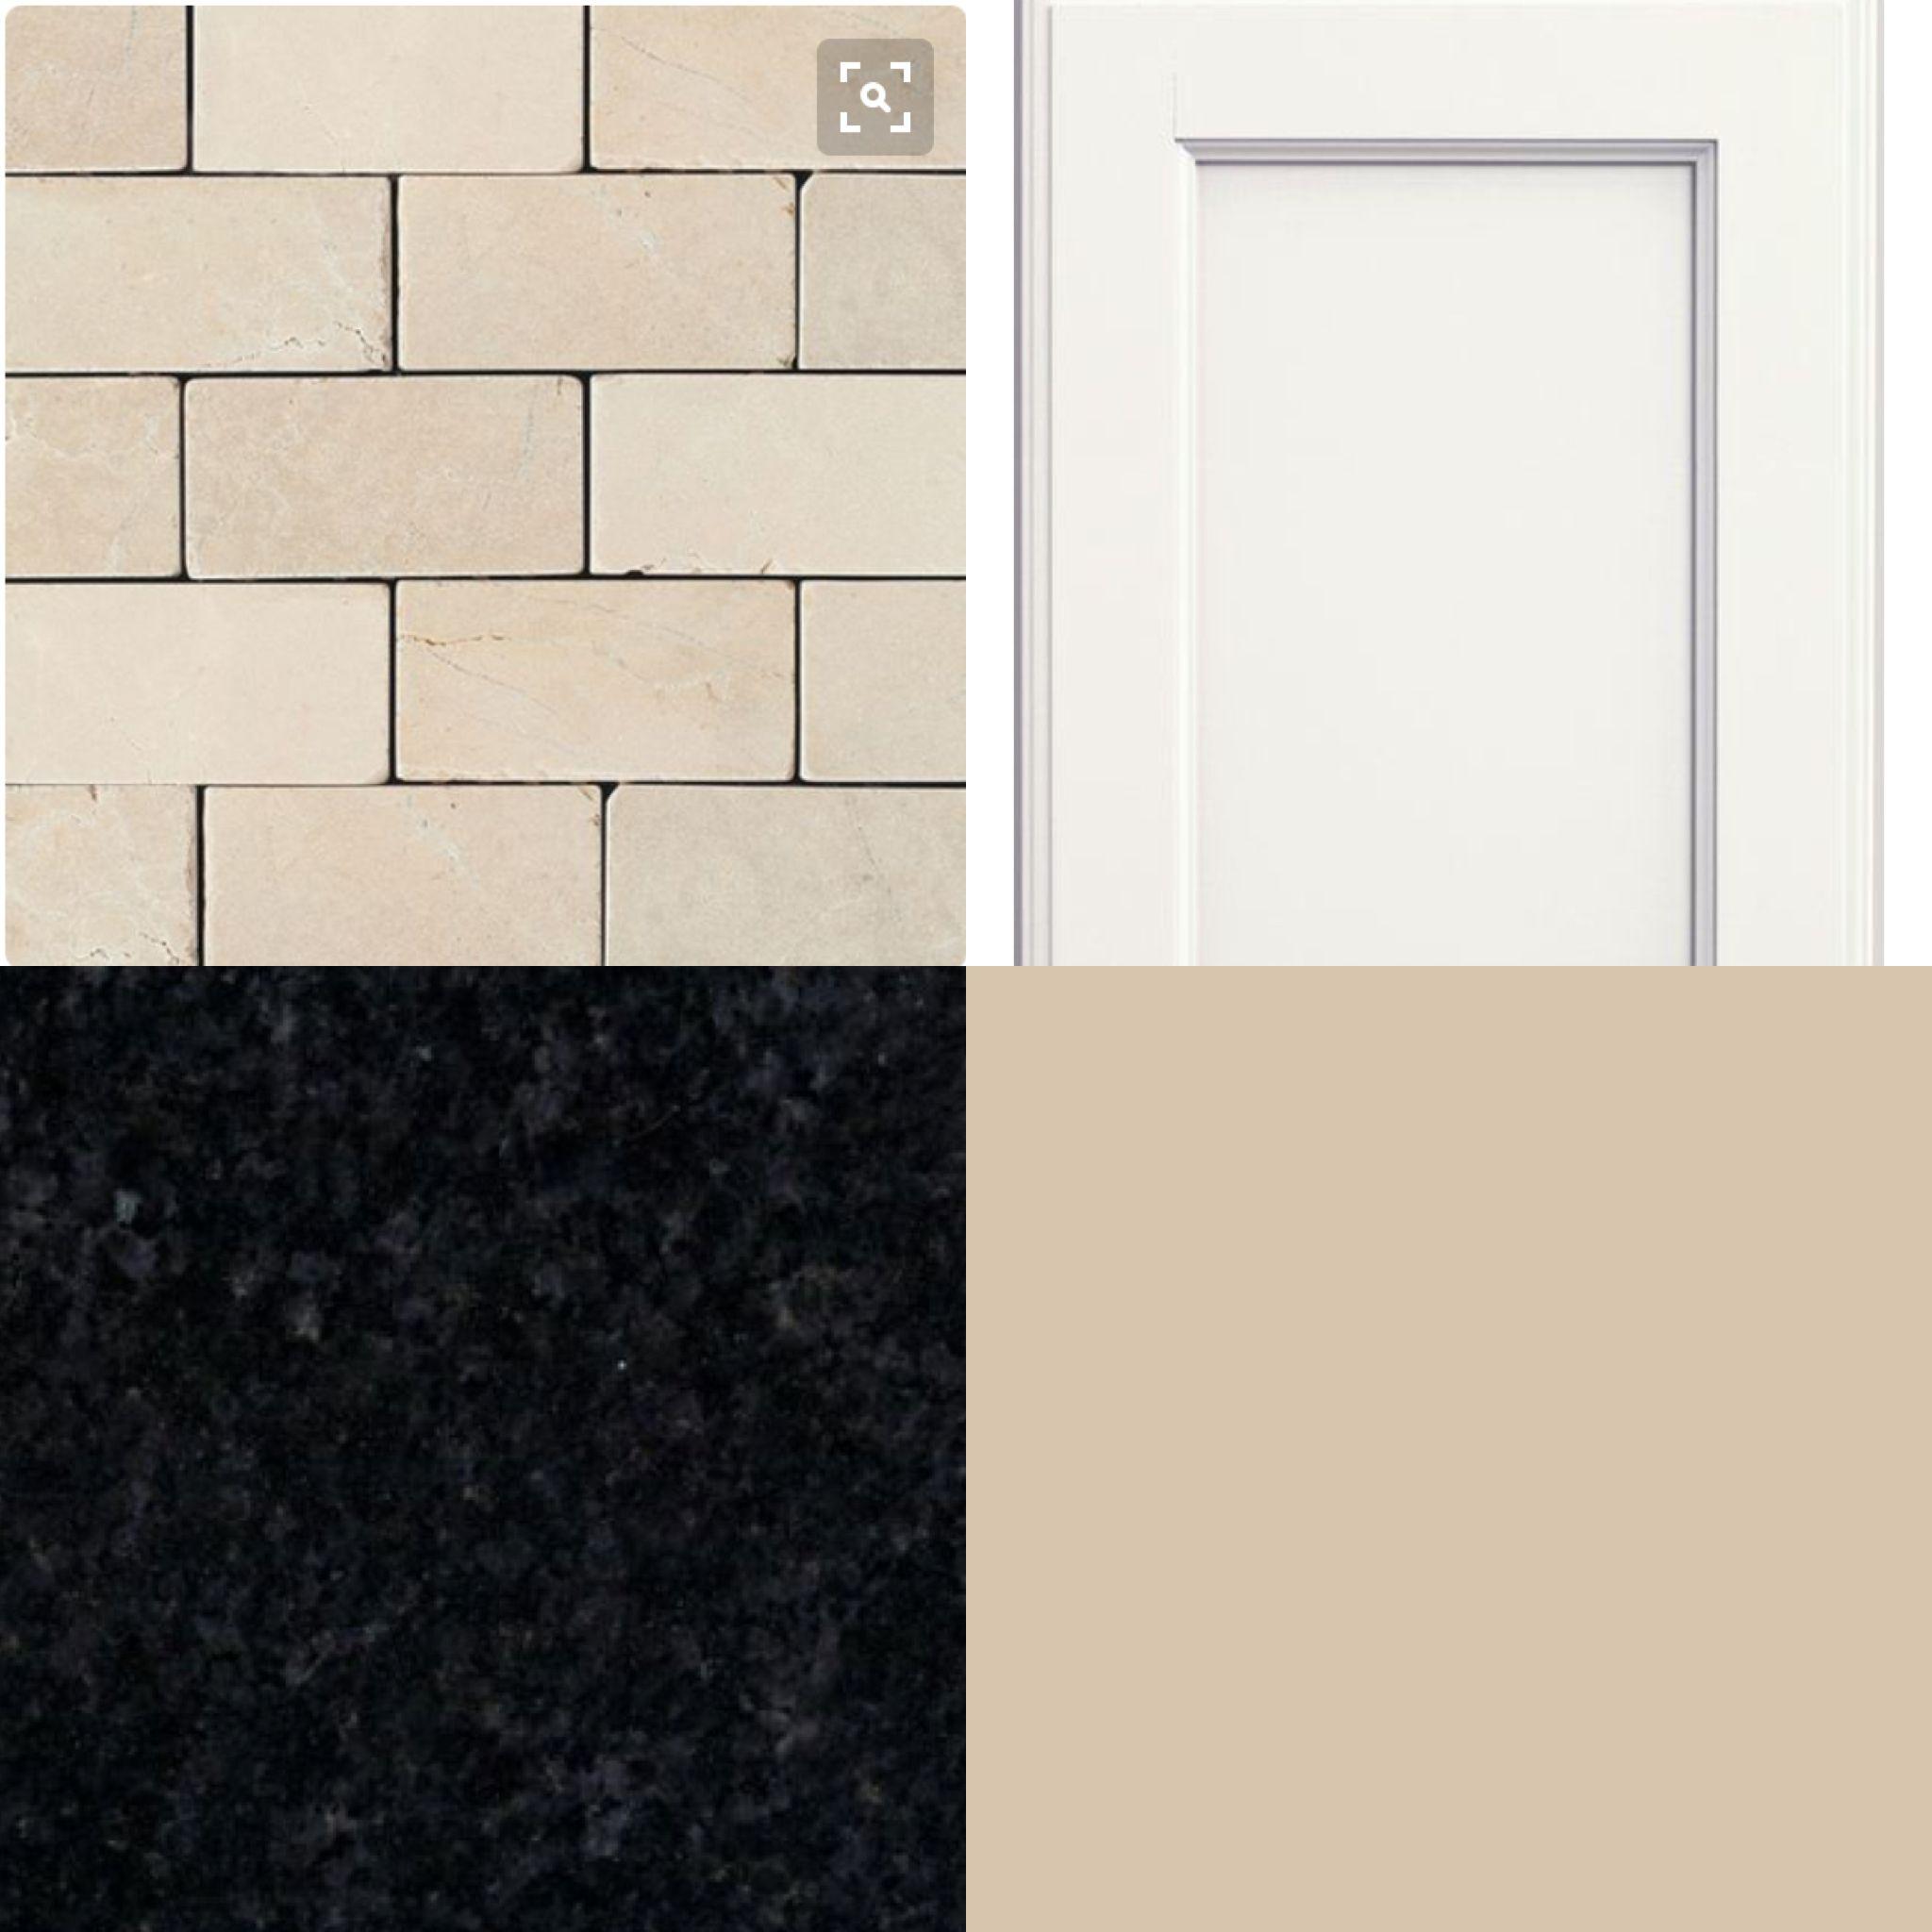 Crema Marfil Tumble Stone Snowdrift Cabinets Black Pearl Granite Kilim Beige Paint